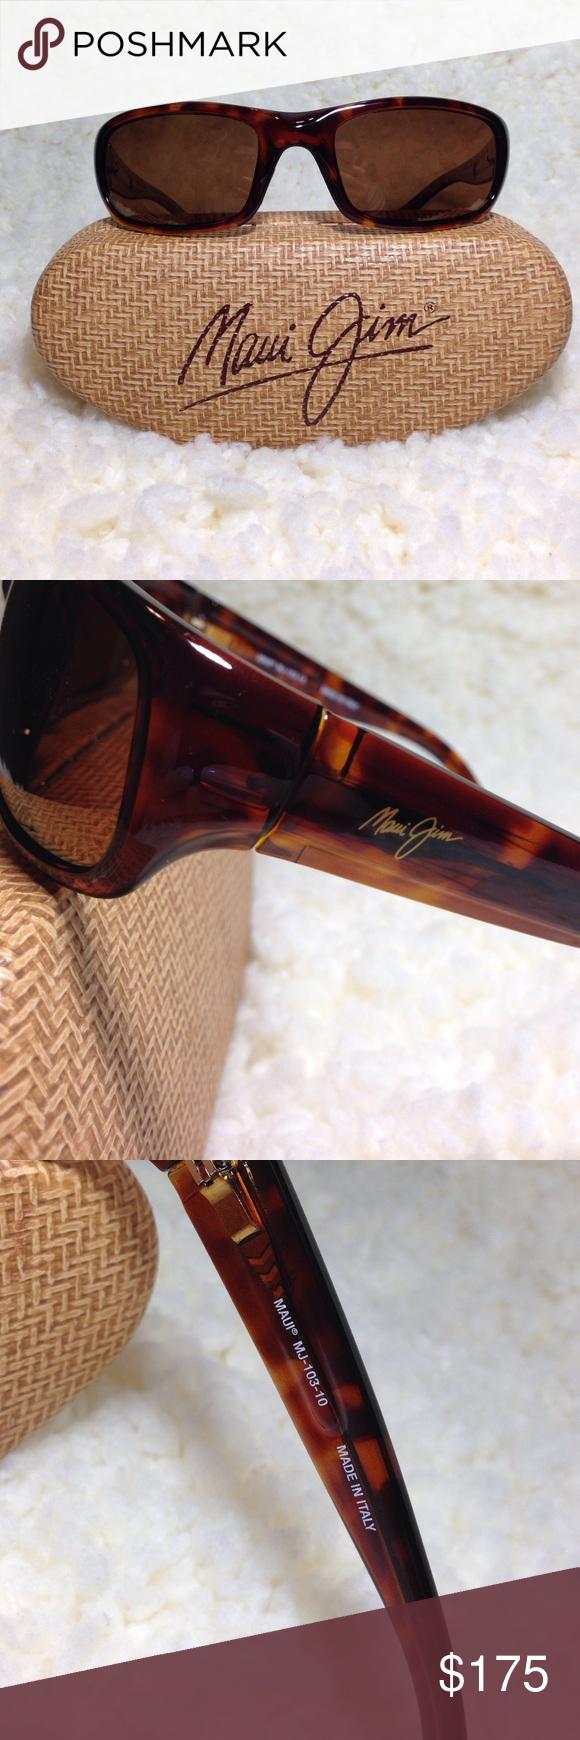 Maui Jim stringray sunglasses. NWOT | Pinterest